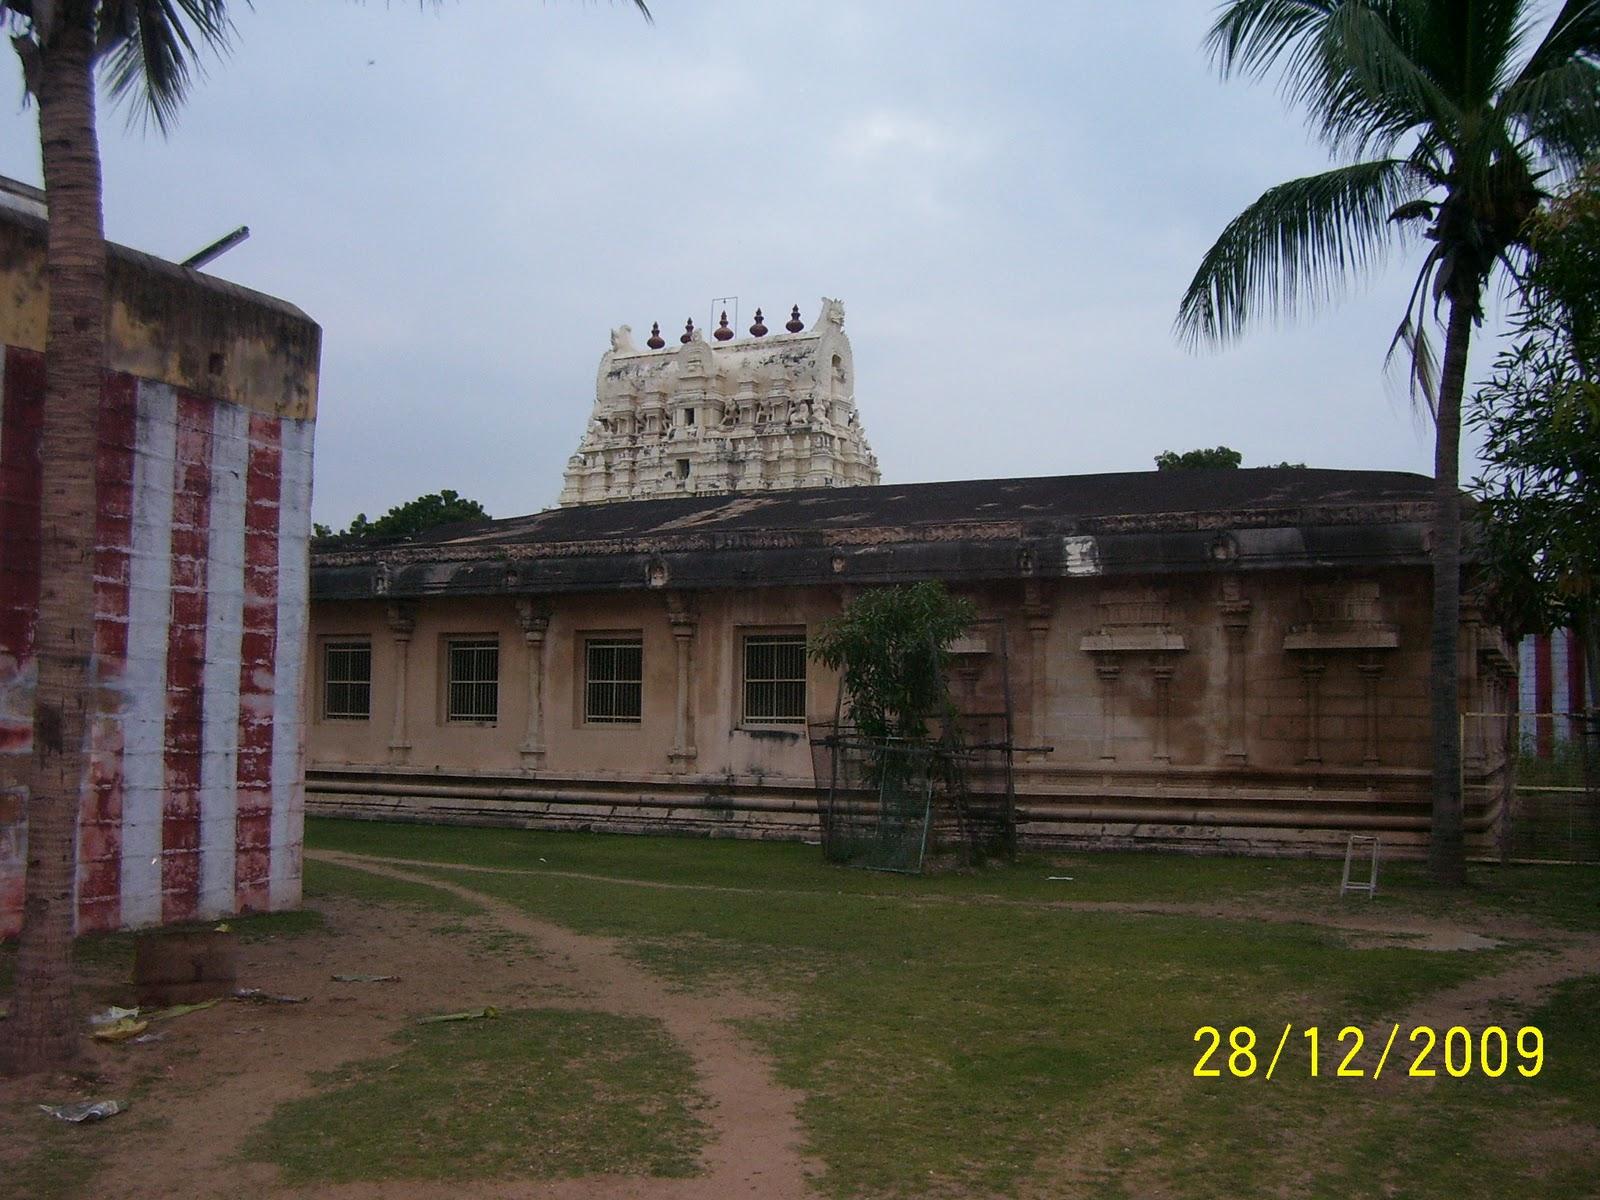 Adhinaatha Perumal Temple - Thirukkurugur (Azhwar Thirunagari), Nava Tirupathi - Nine Holy Temples